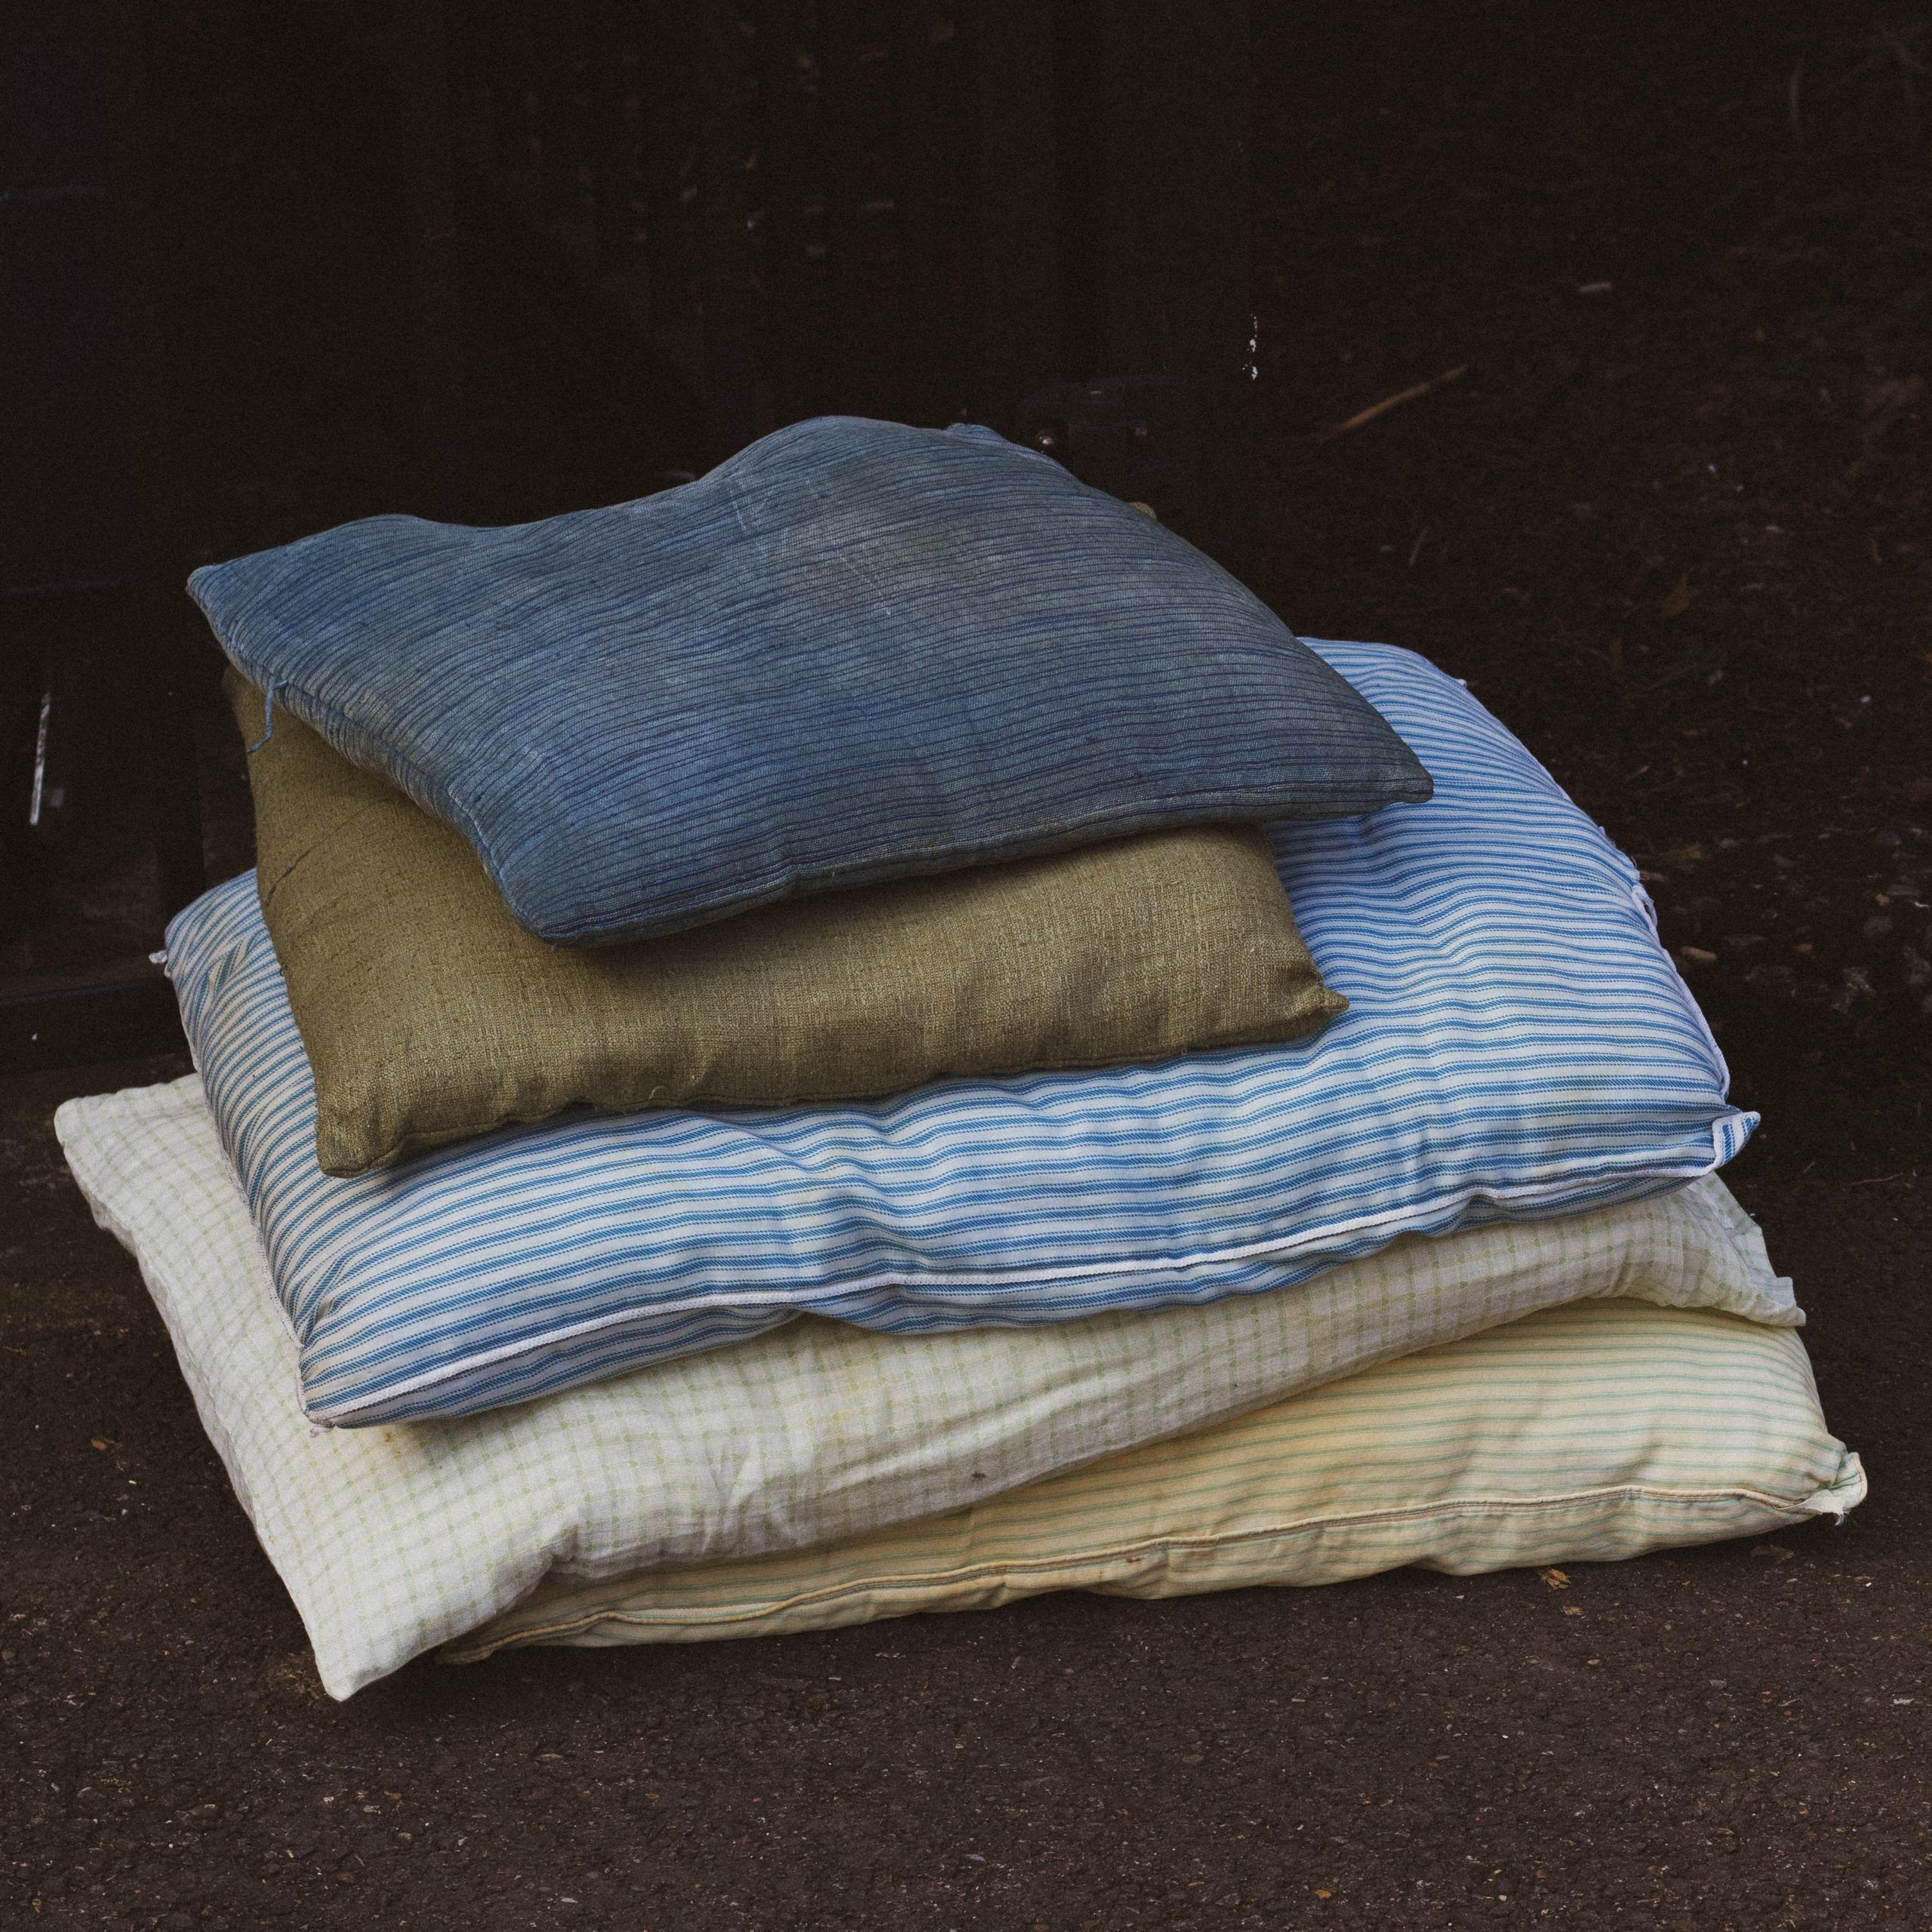 La importancia de lavar las almohadas